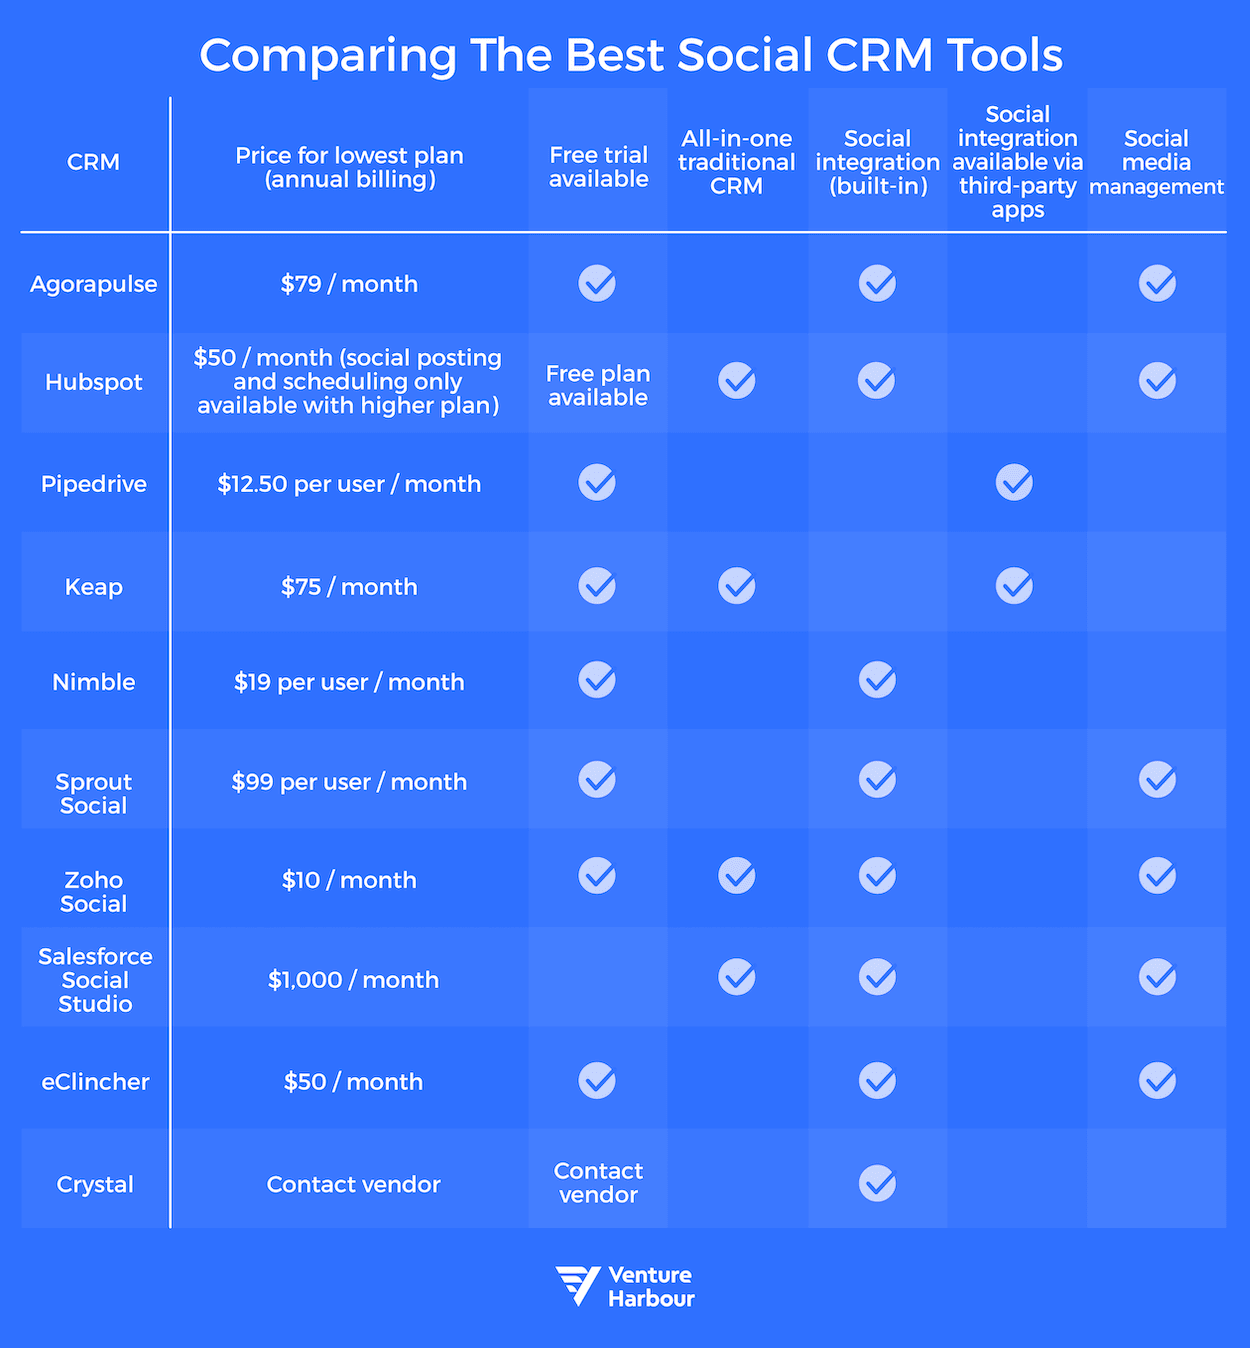 best social crm tools comparison